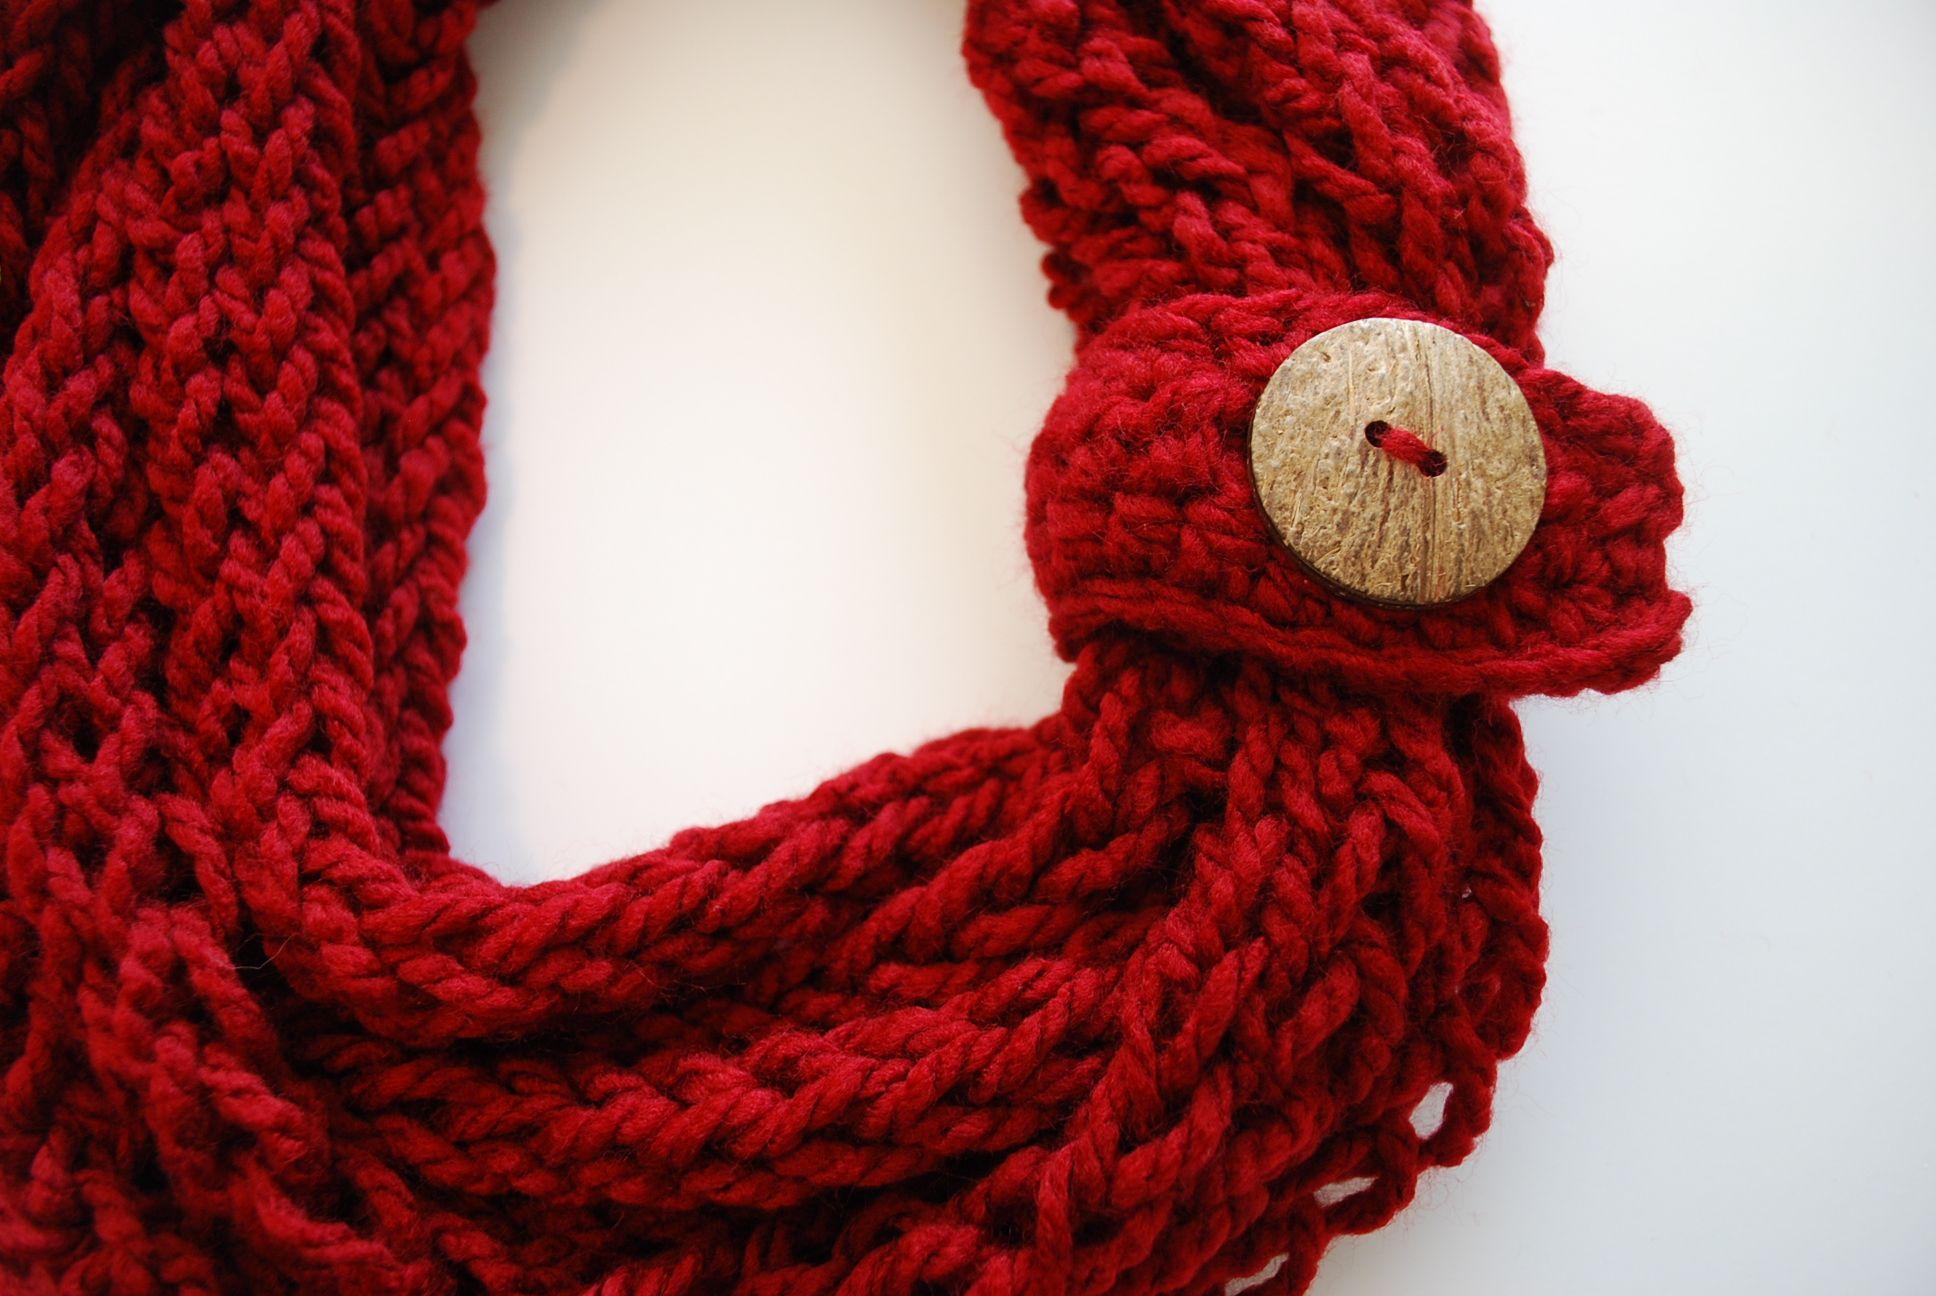 Finger Knit Infinity Scarf | Finger knitting, Crochet infinity scarf ...